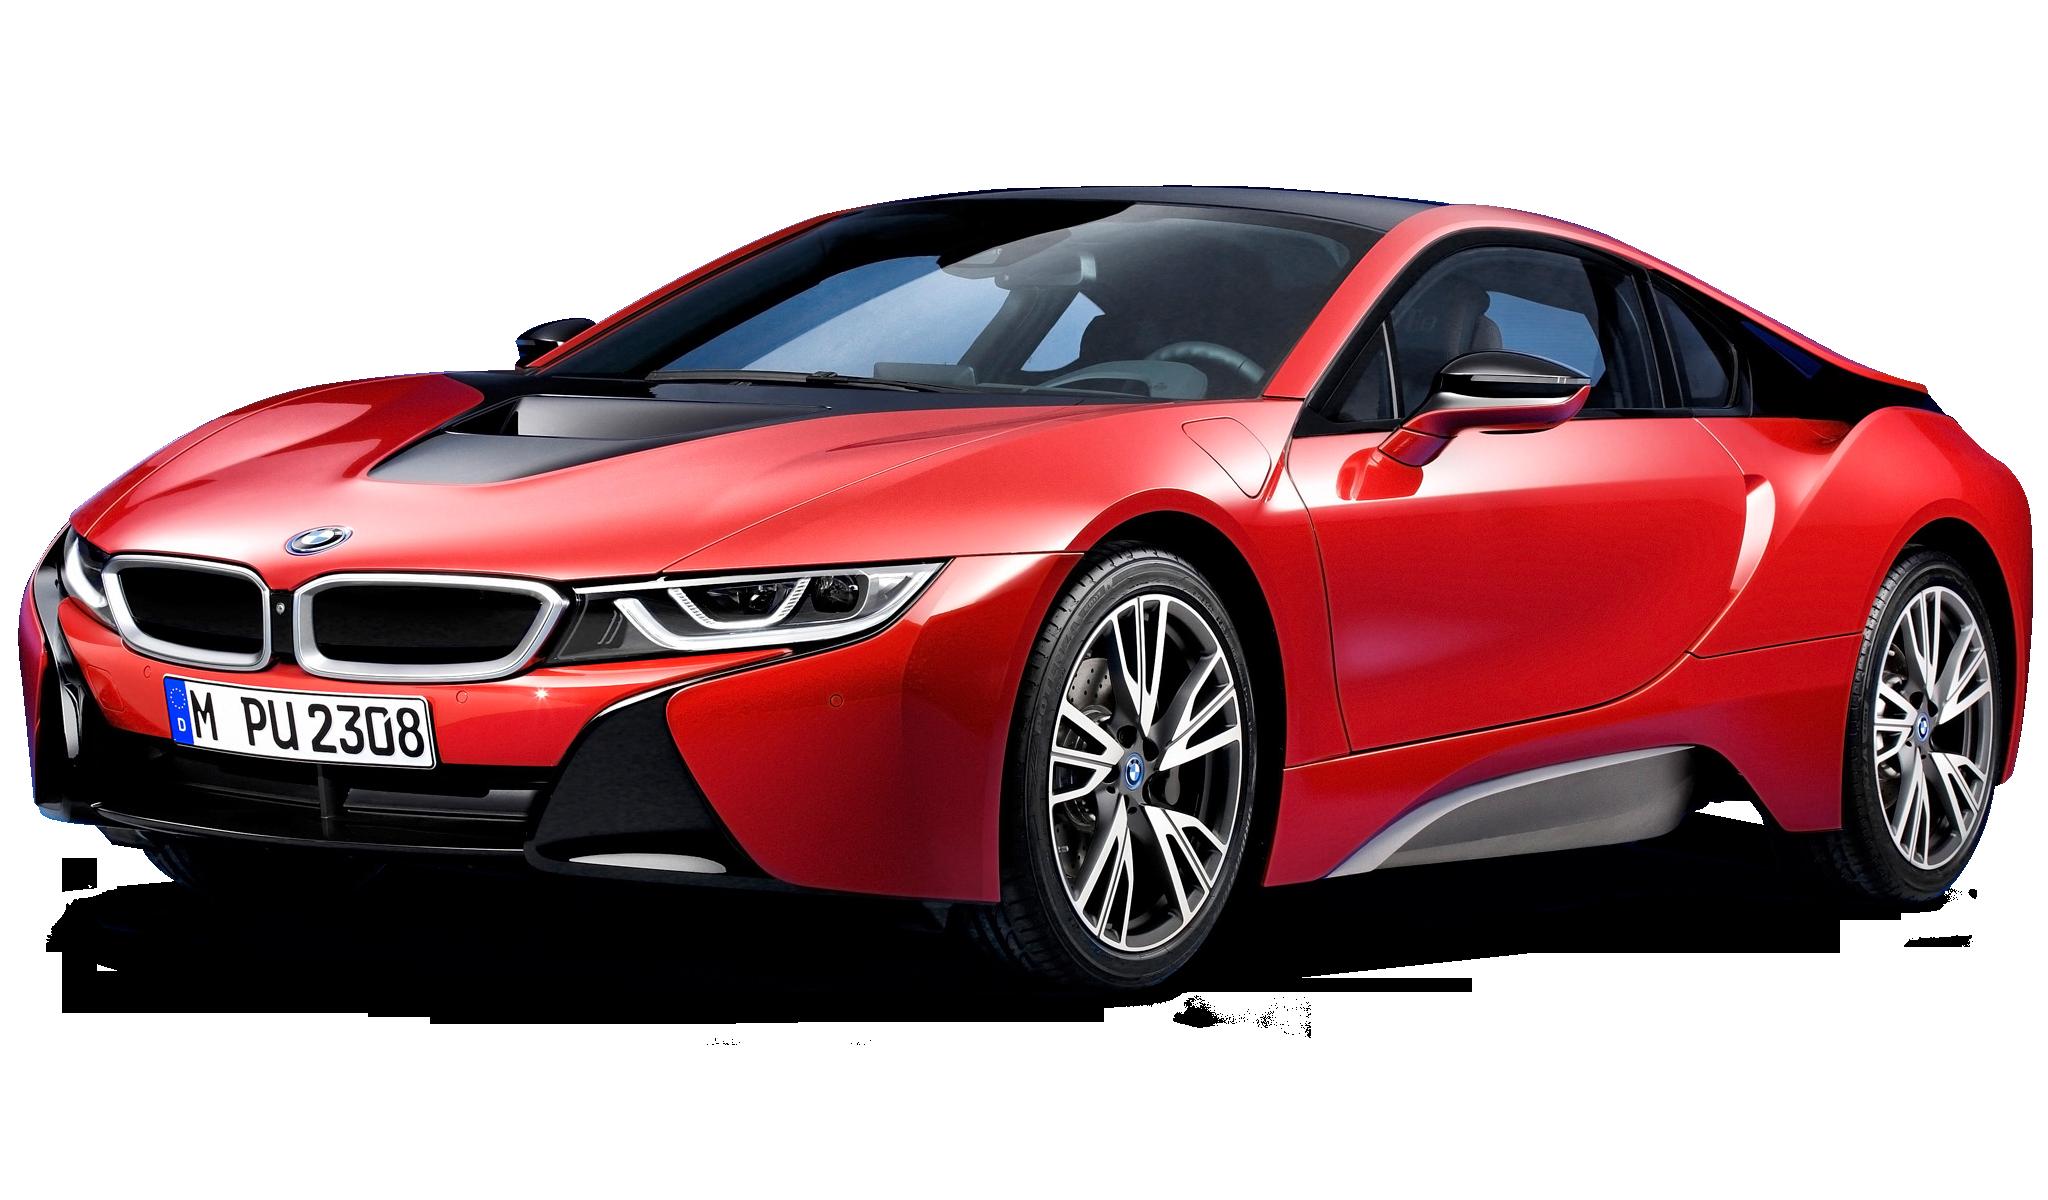 BMW Car PNG image PngPix ~ Car Wallpaper.